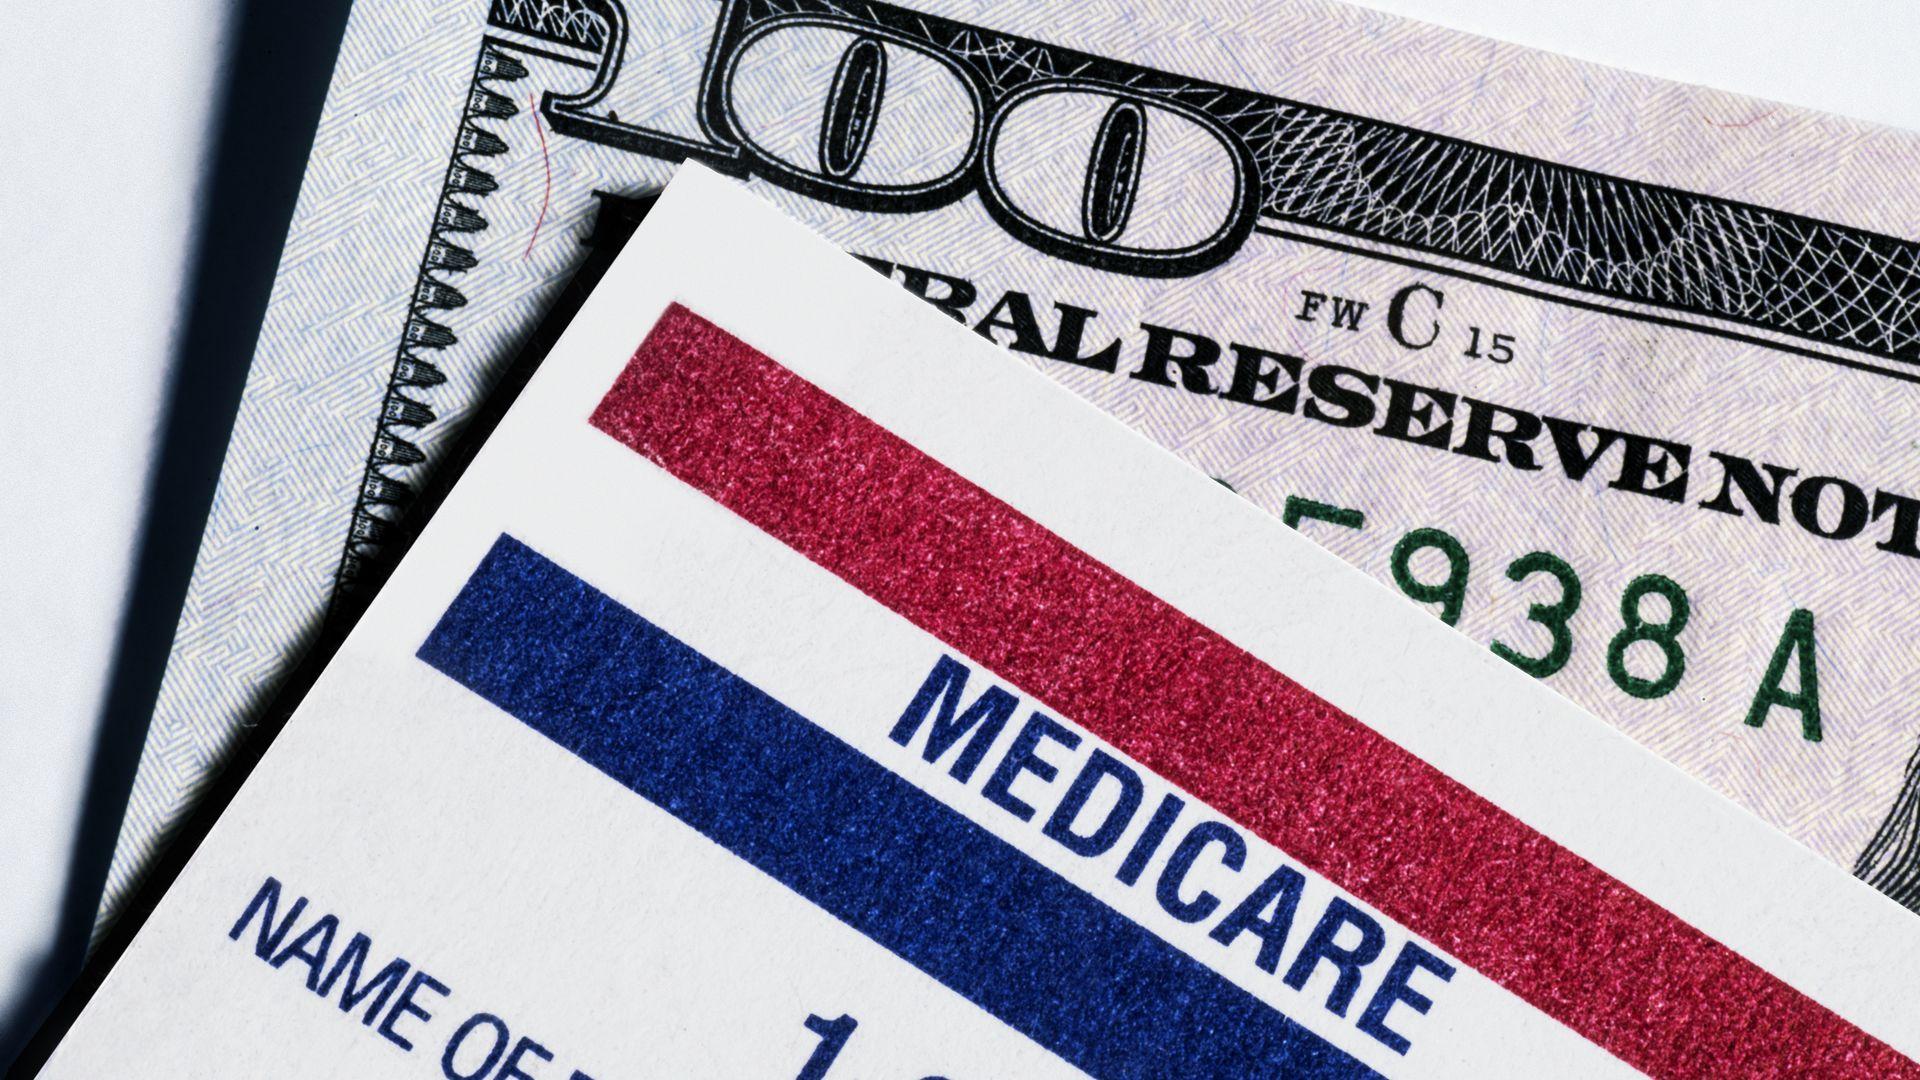 Medicare card on top of a hundred dollar bill